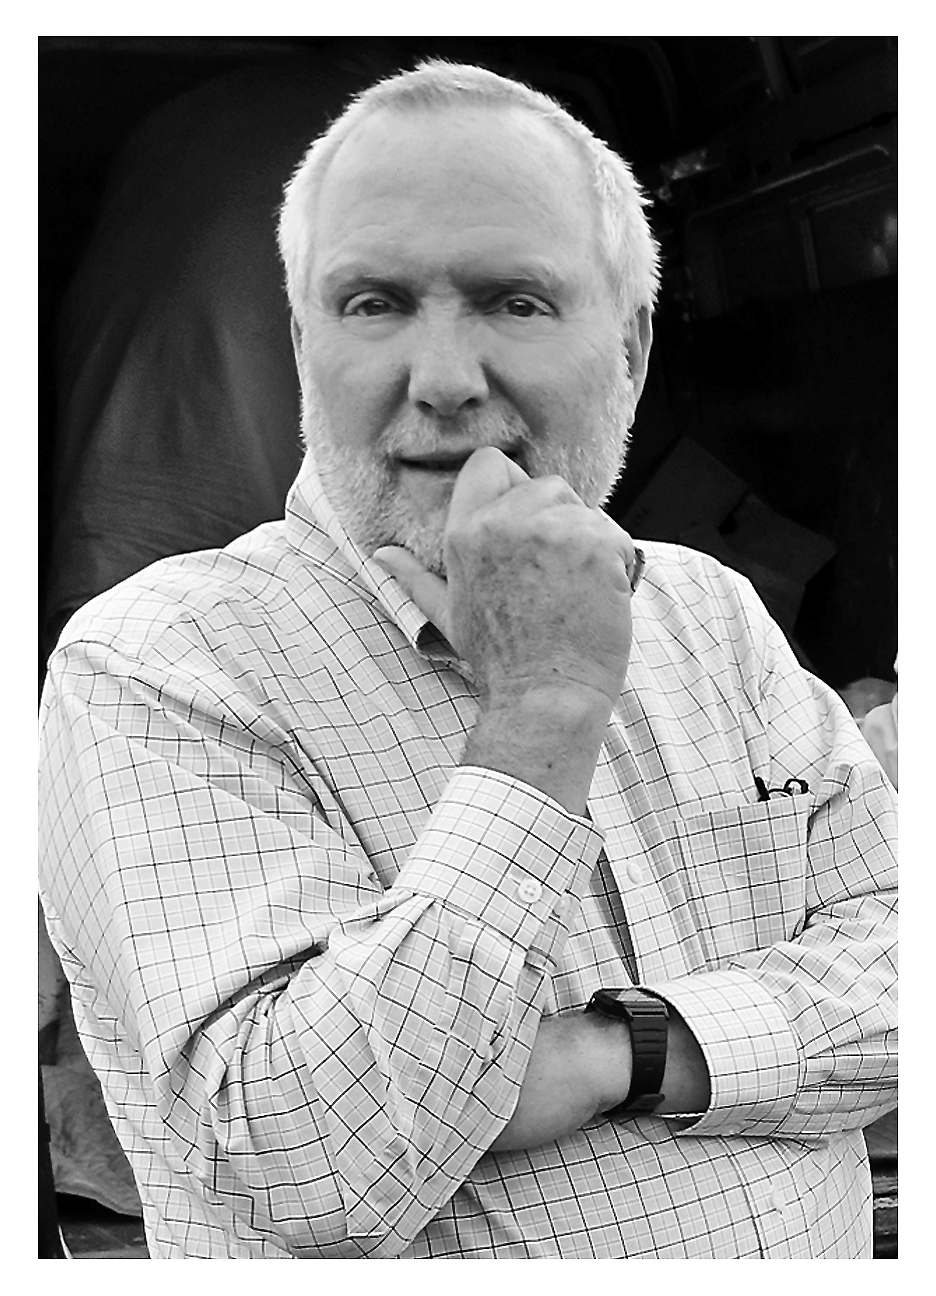 Microboard Remembers Its' Founder & Chairman Craig T. Hoekenga